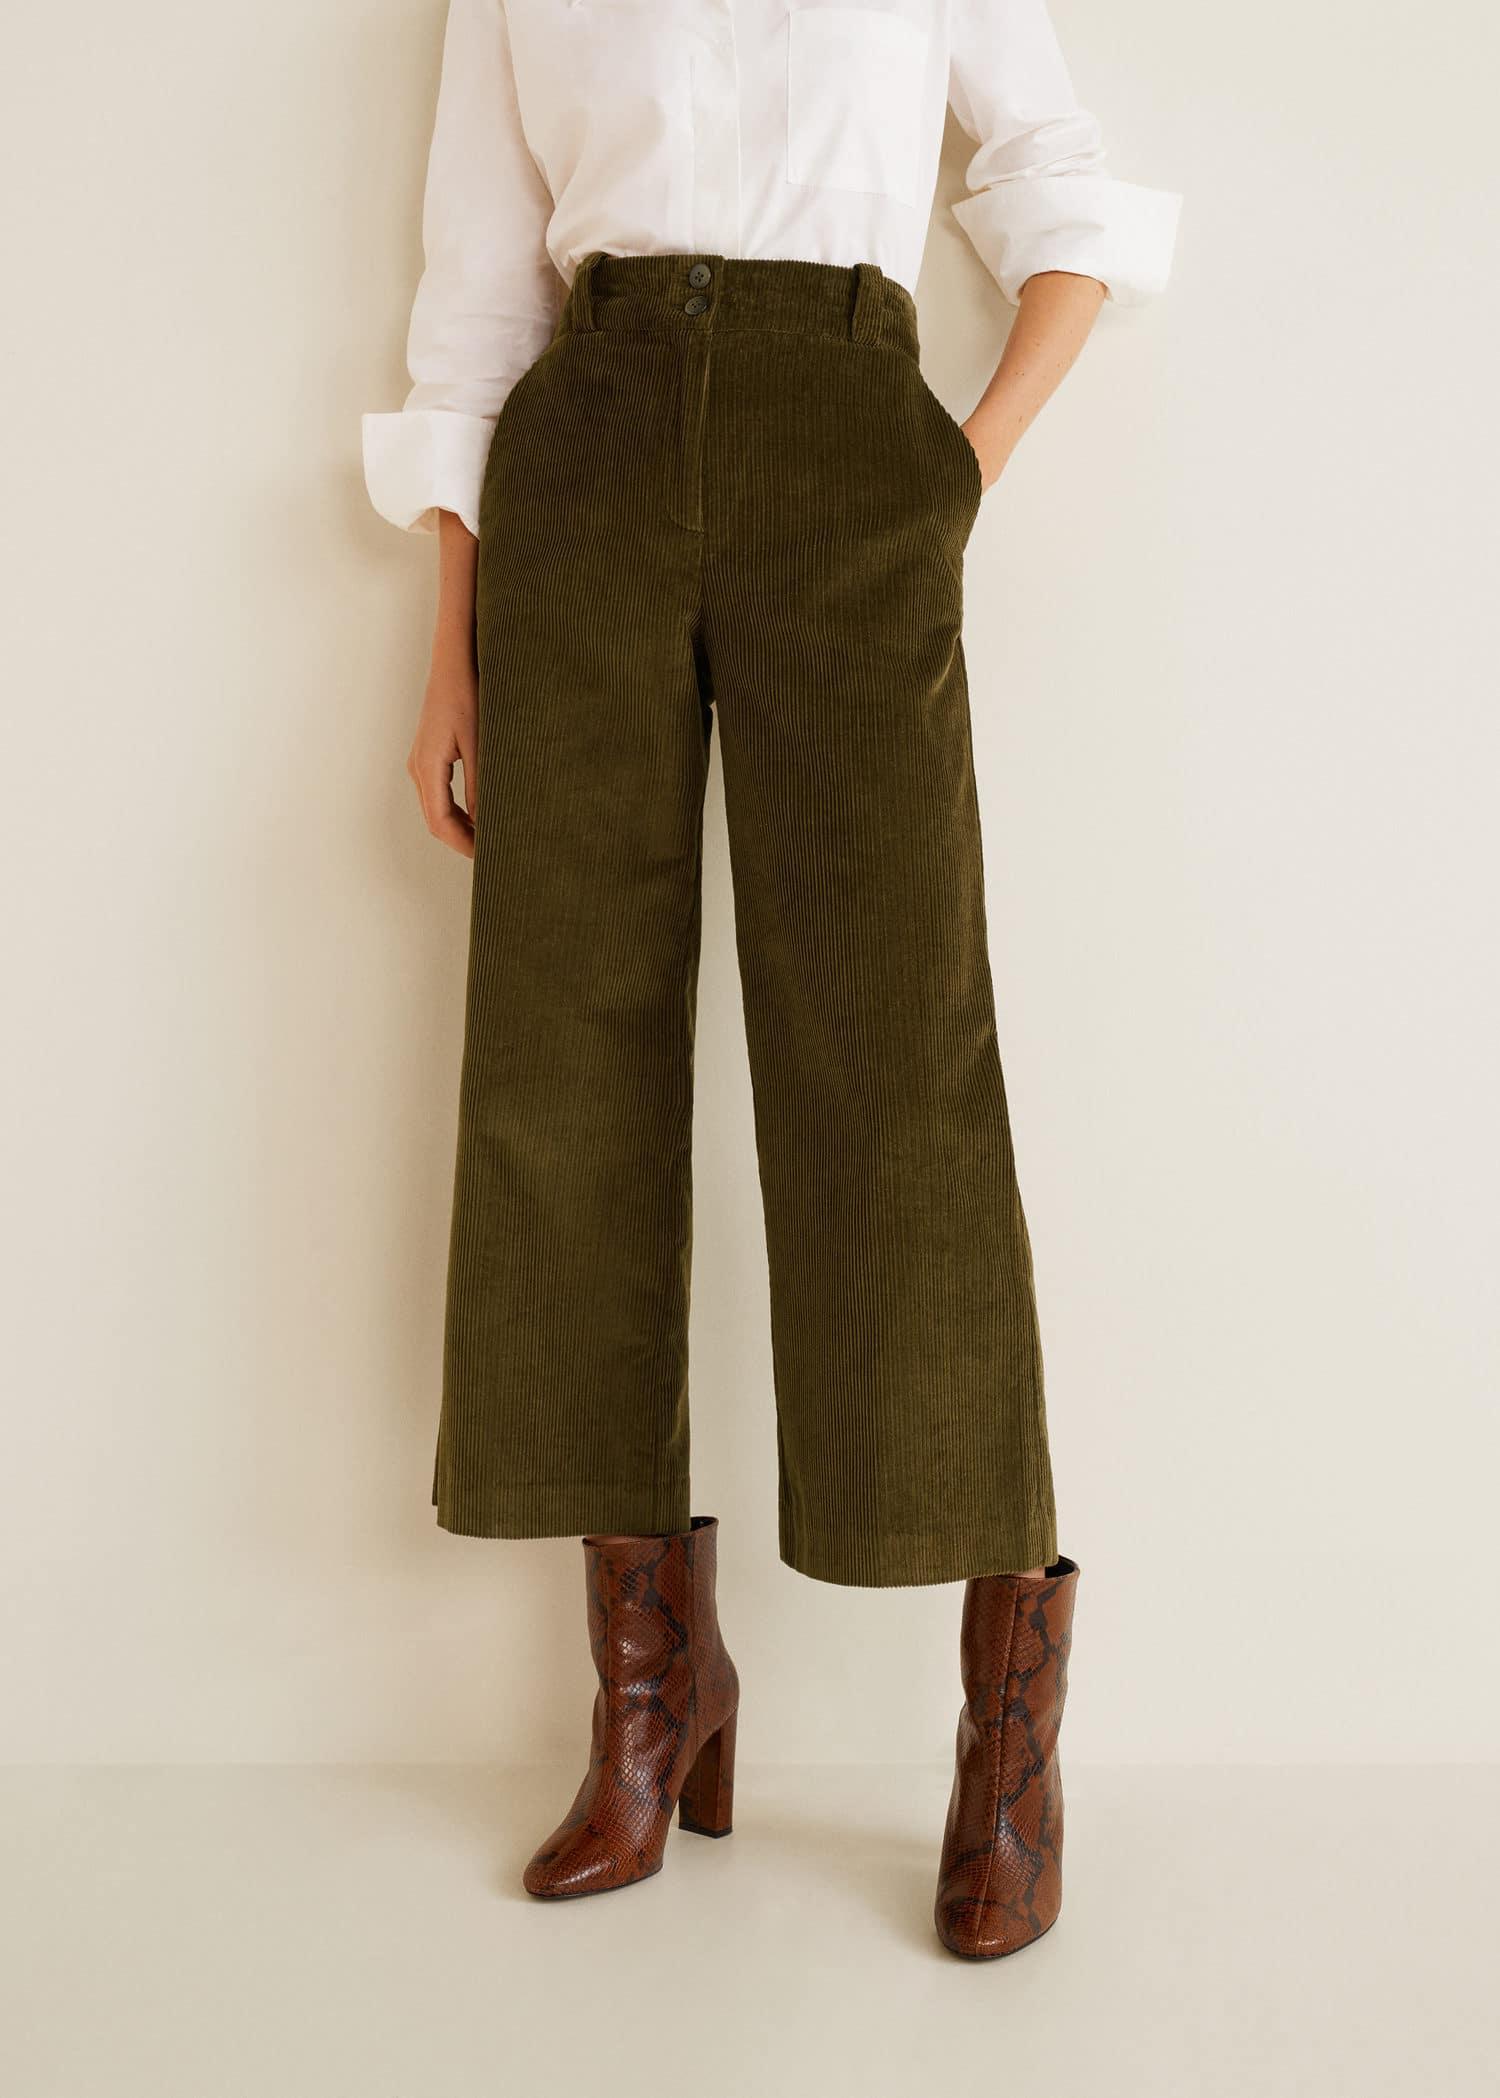 منقولة أقرض البخيل Pantalon Pana Mujer Outofstepwineco Com